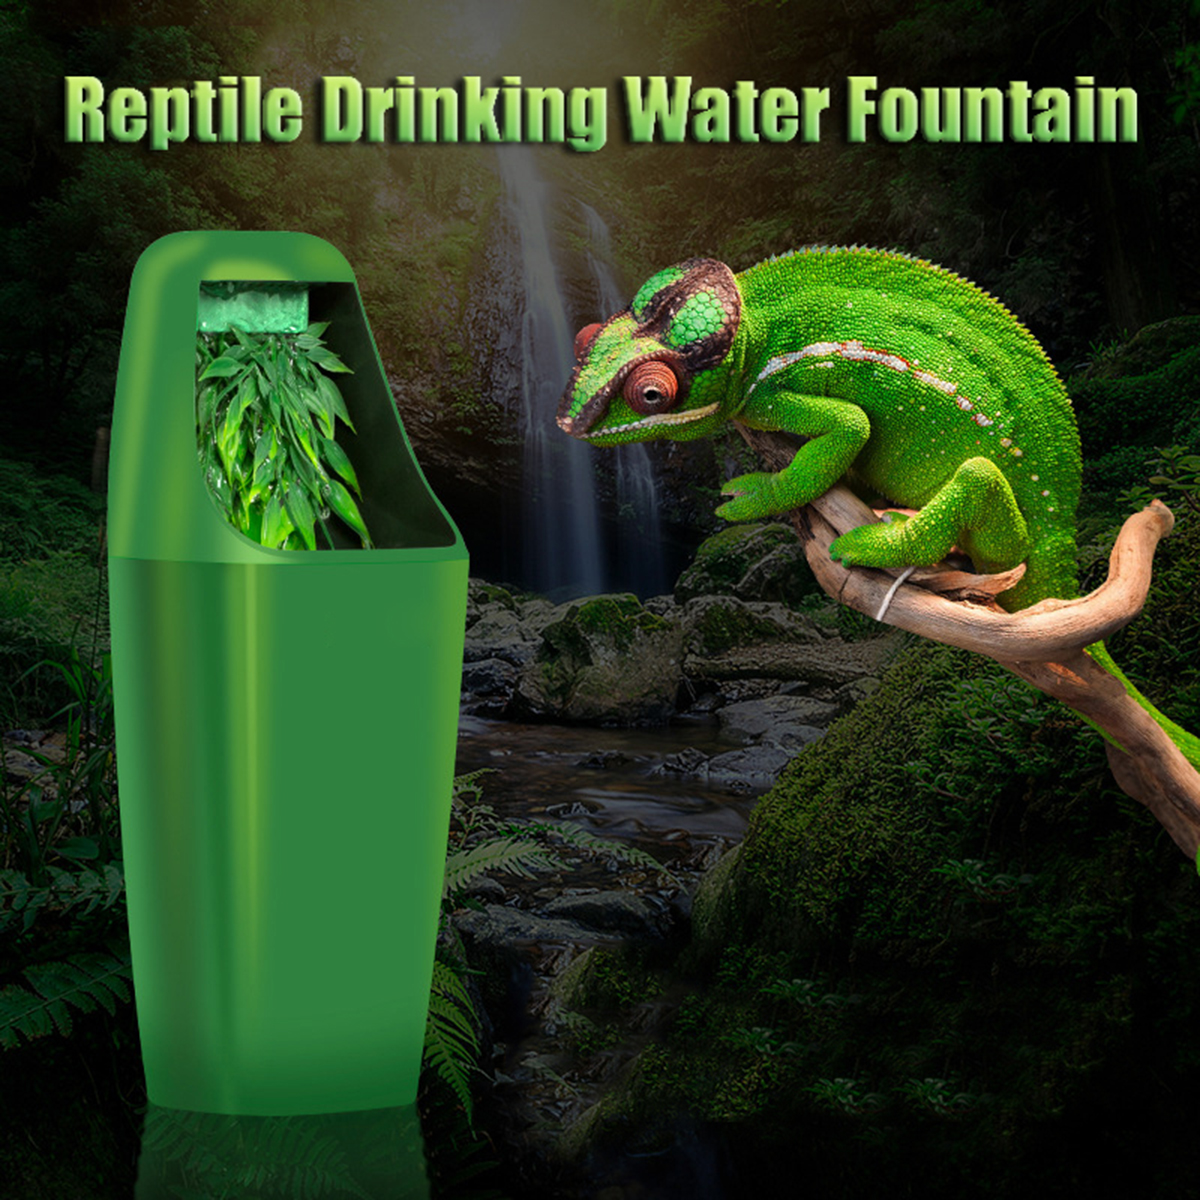 Reptile Drinking Water Filter Fountain Feeding Chameleon Lizard Dispenser Terrarium Reptiles Feeding Supplies 220-240V AC